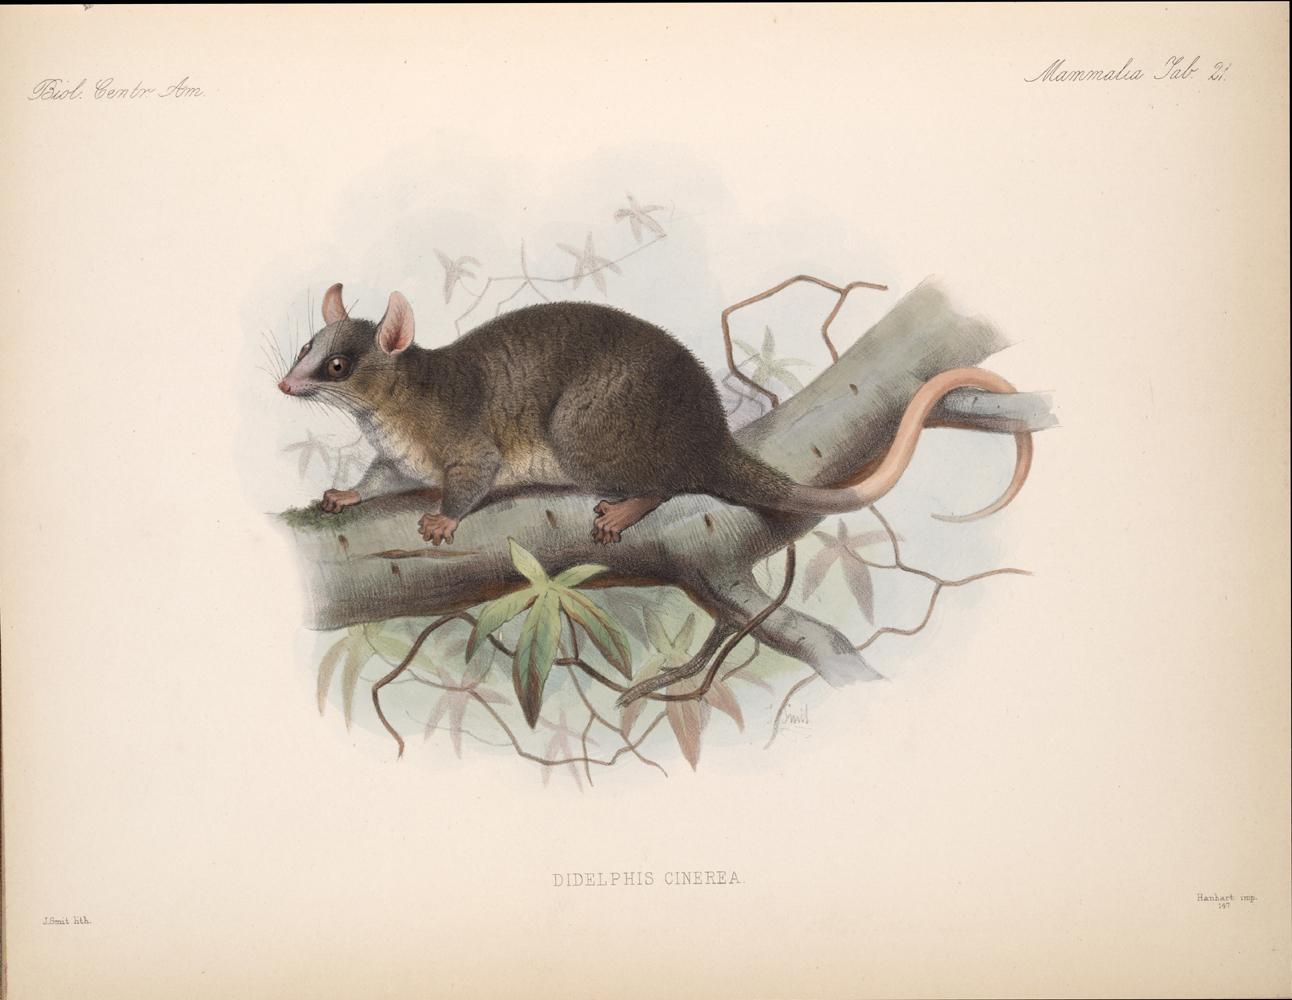 Mammals,  Image number:bca_02_00_00_289